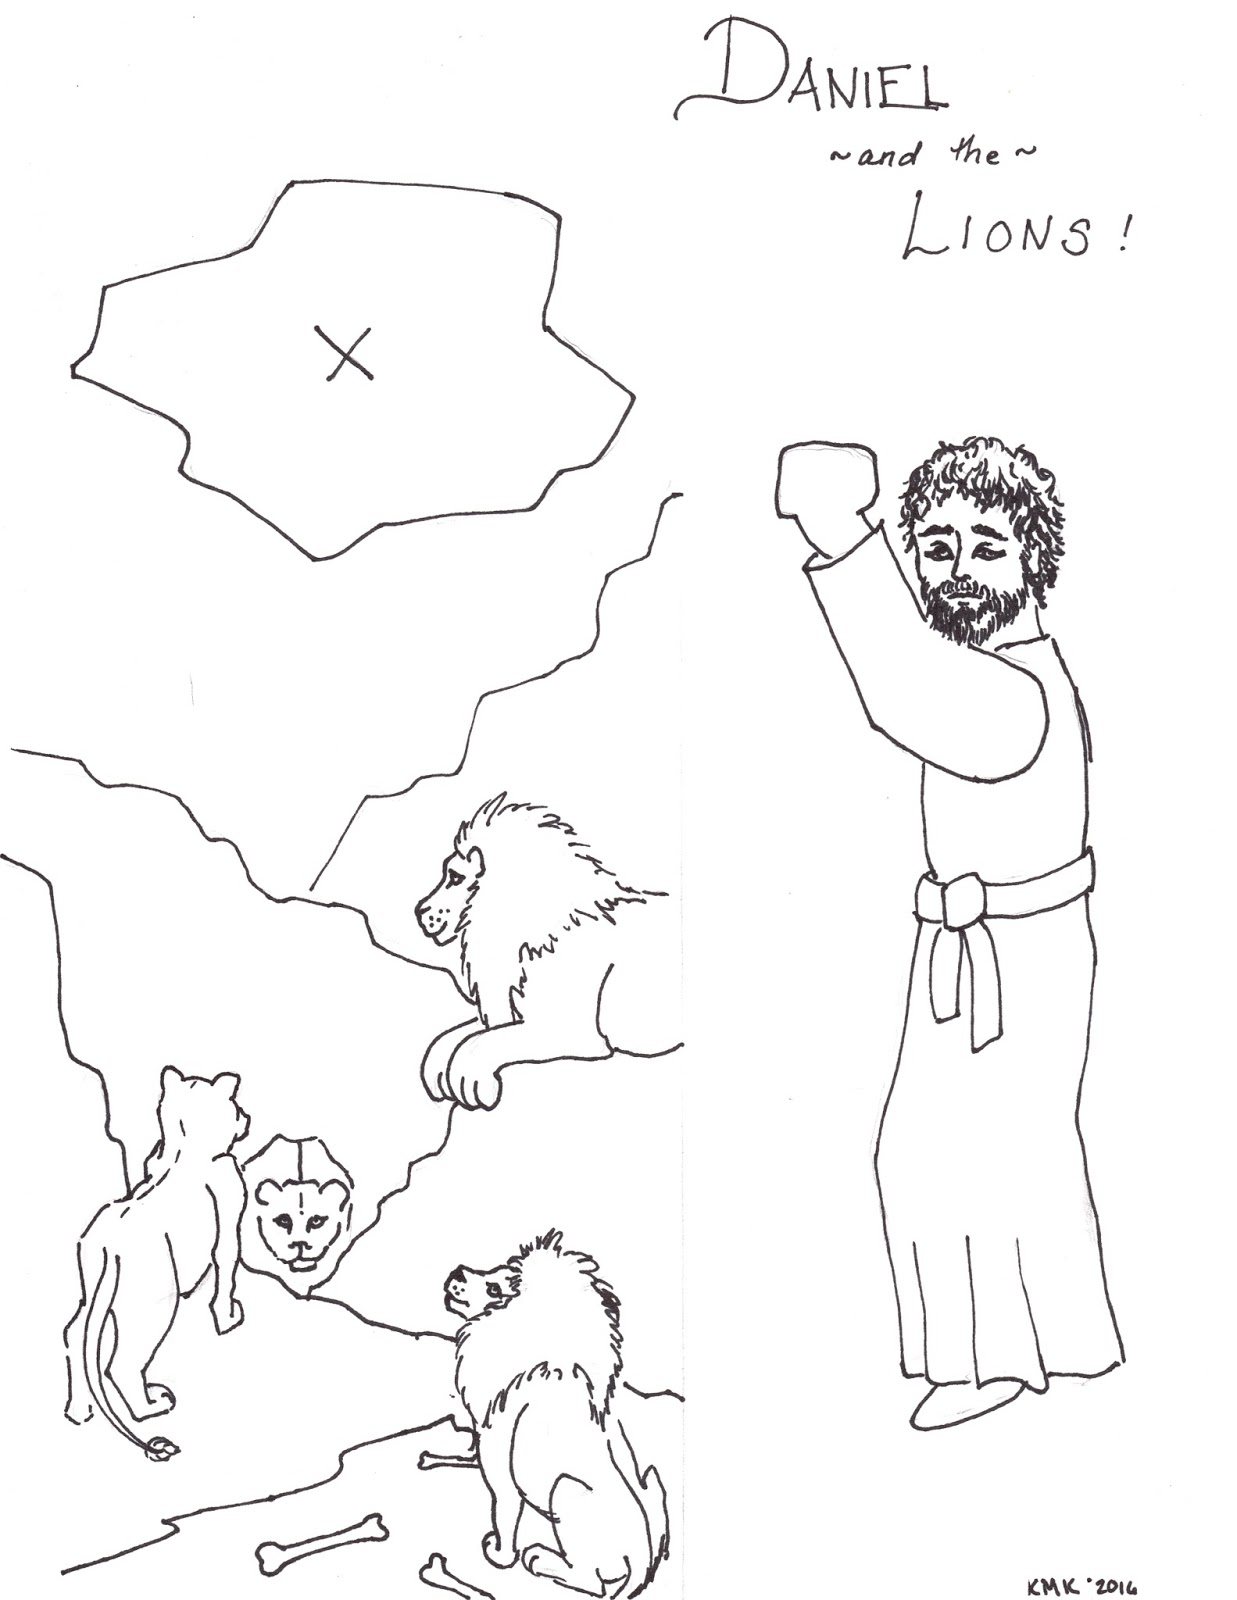 Grow Wild My Child: Free Printable of Daniel for Sunday School